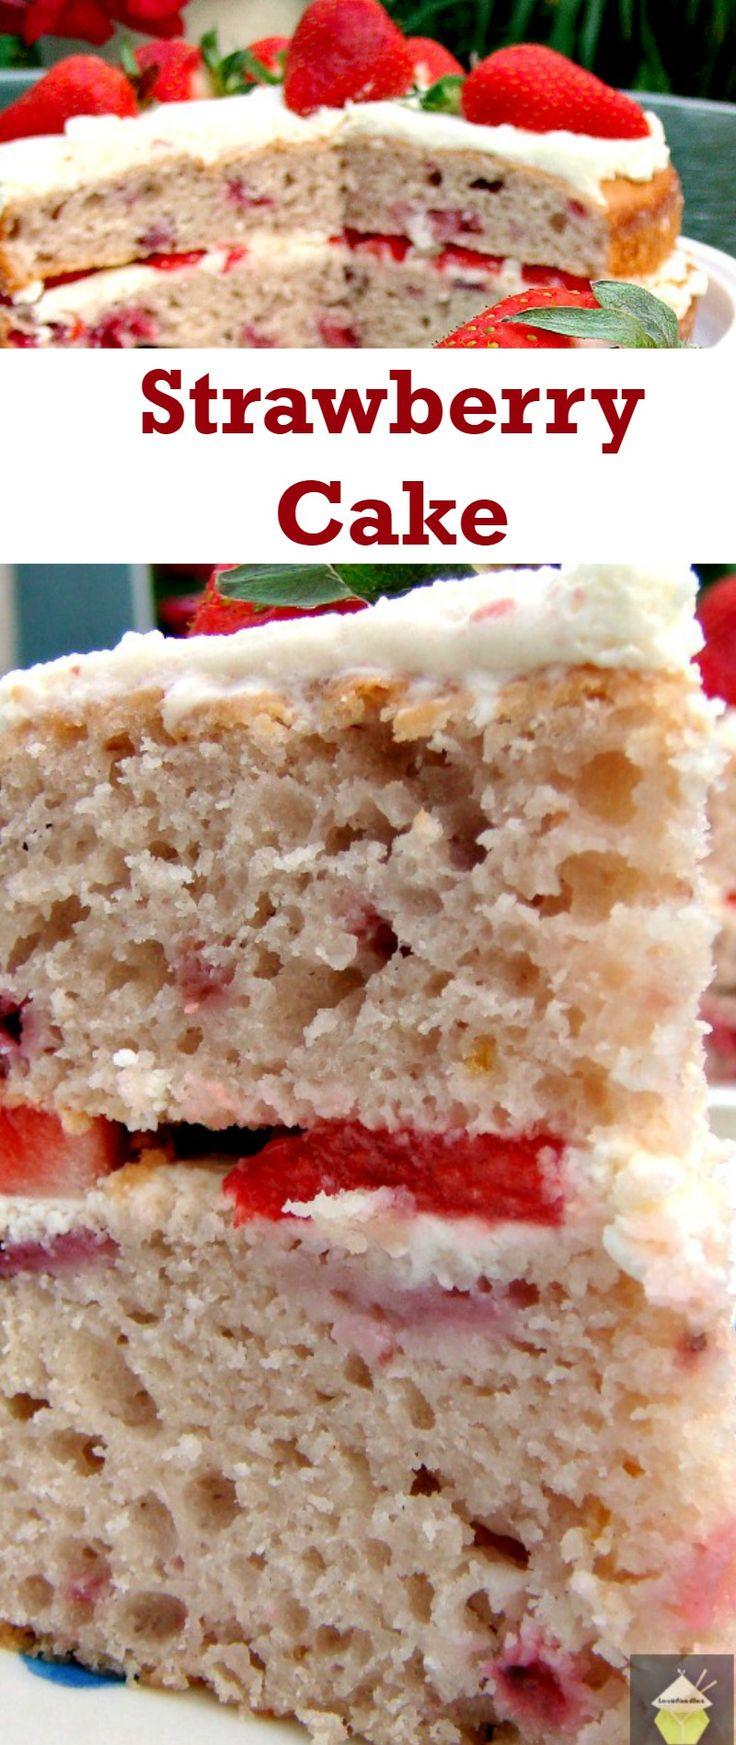 Strawberry Flavour Cake Images : 25+ best ideas about Strawberry yogurt cake on Pinterest ...